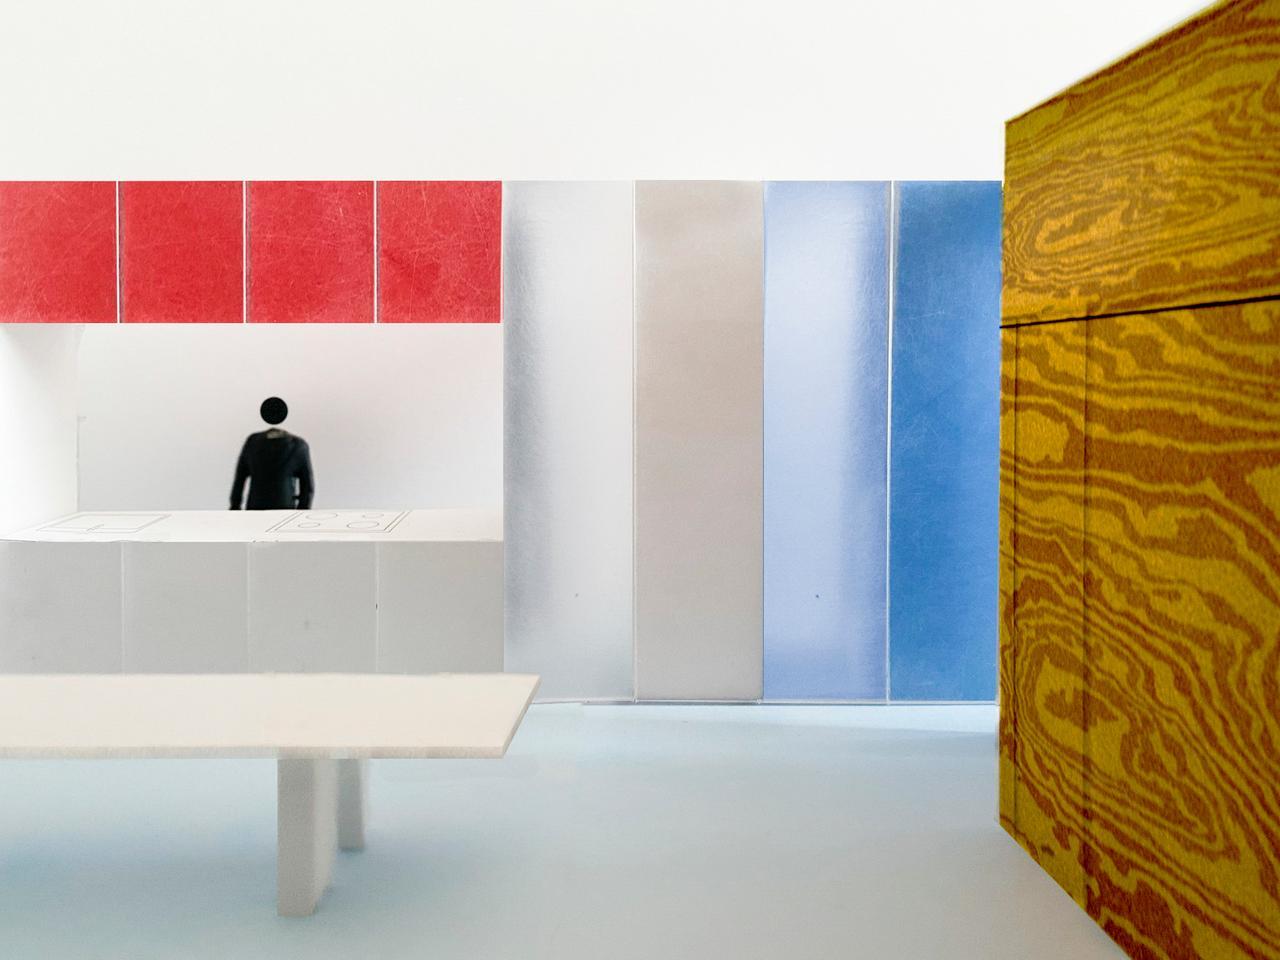 Material property, Rectangle, Art, Shelving, Paint, Floor, Line